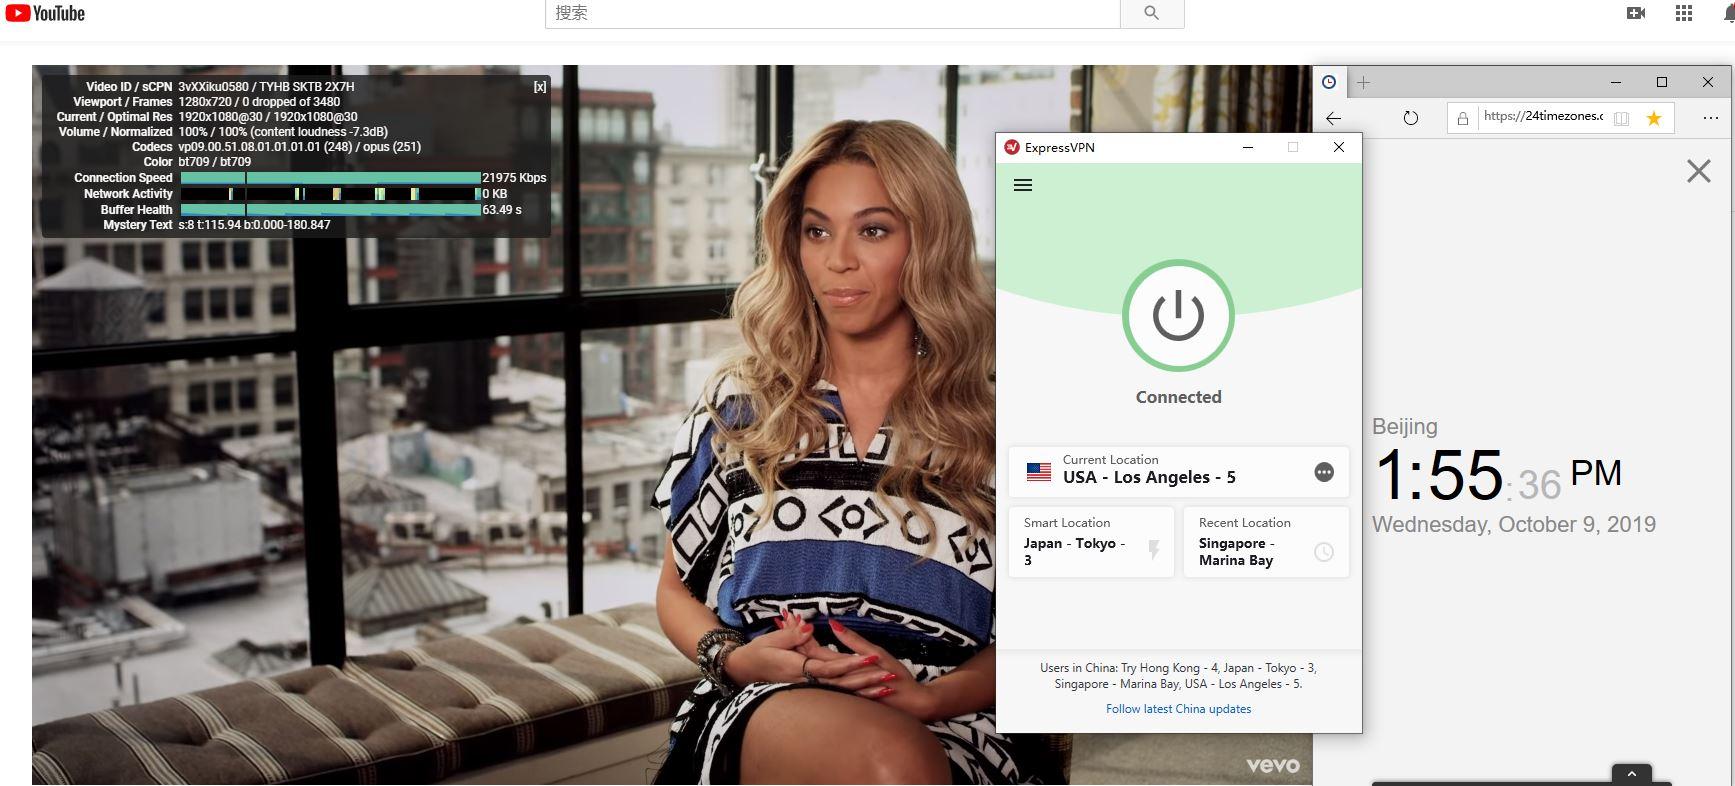 Windows ExpressVPN USA - Los Angeles - 5 中国VPN翻墙 科学上网 YouTube速测-20191009